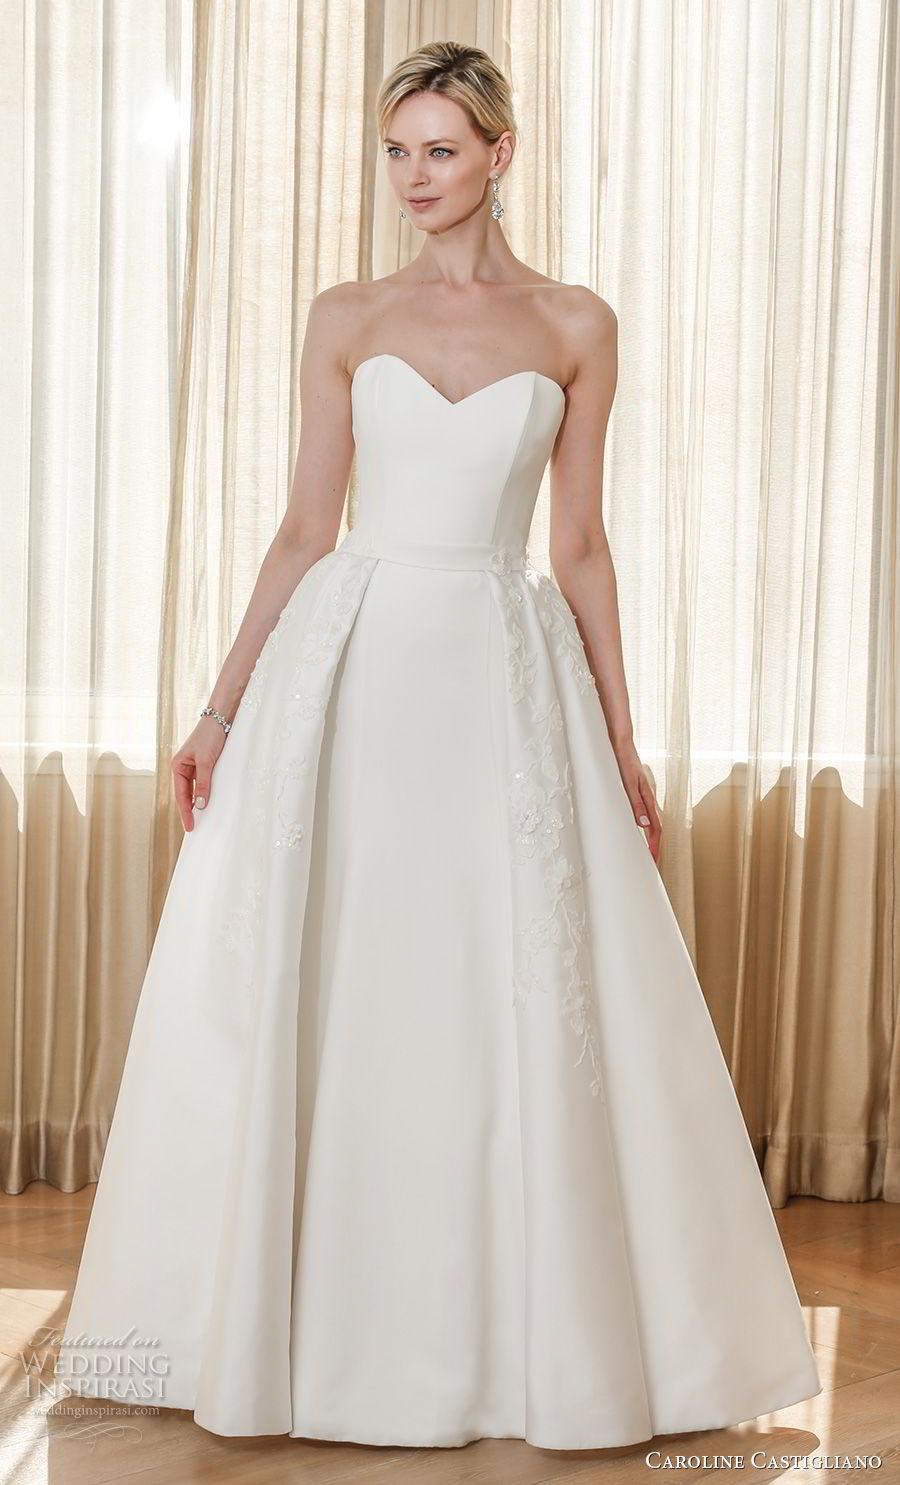 Caroline Castigliano 2019 Wedding Dresses | Wedding Inspirasi